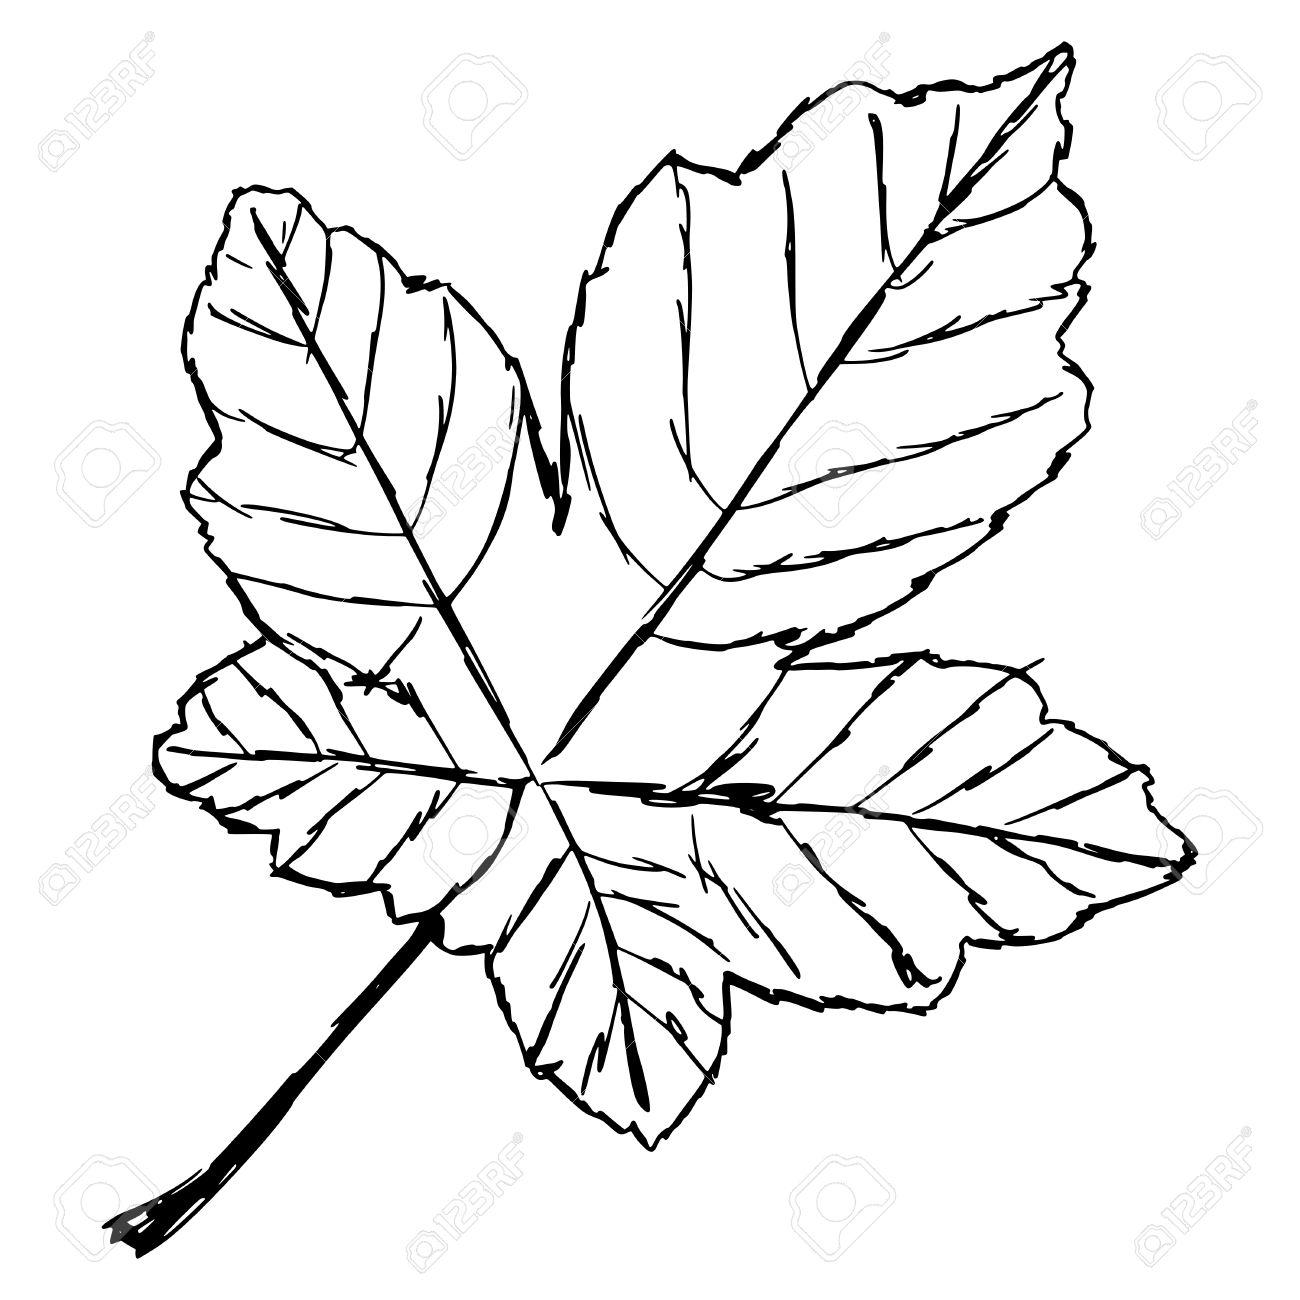 Uncategorized Drawn Leaf hand drawn sketch cartoon illustration of yellow leaf royalty stock vector 28095392